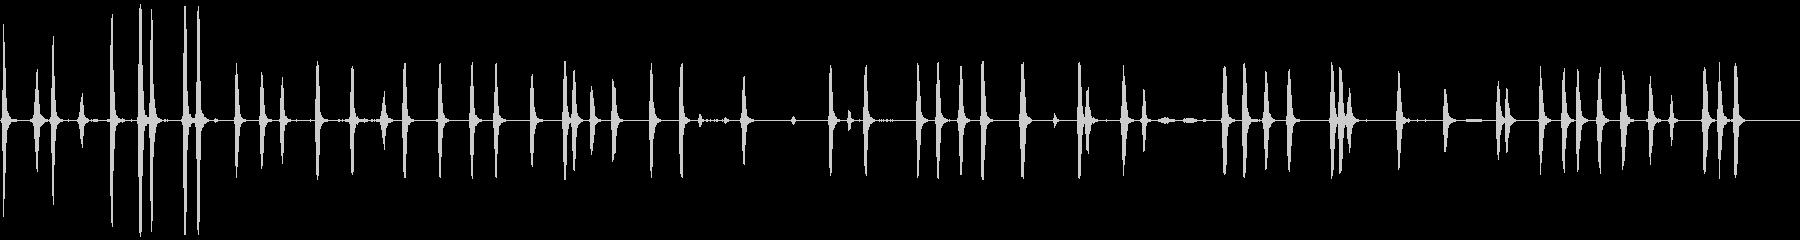 DOG BARKING 5、屋内、...の未再生の波形